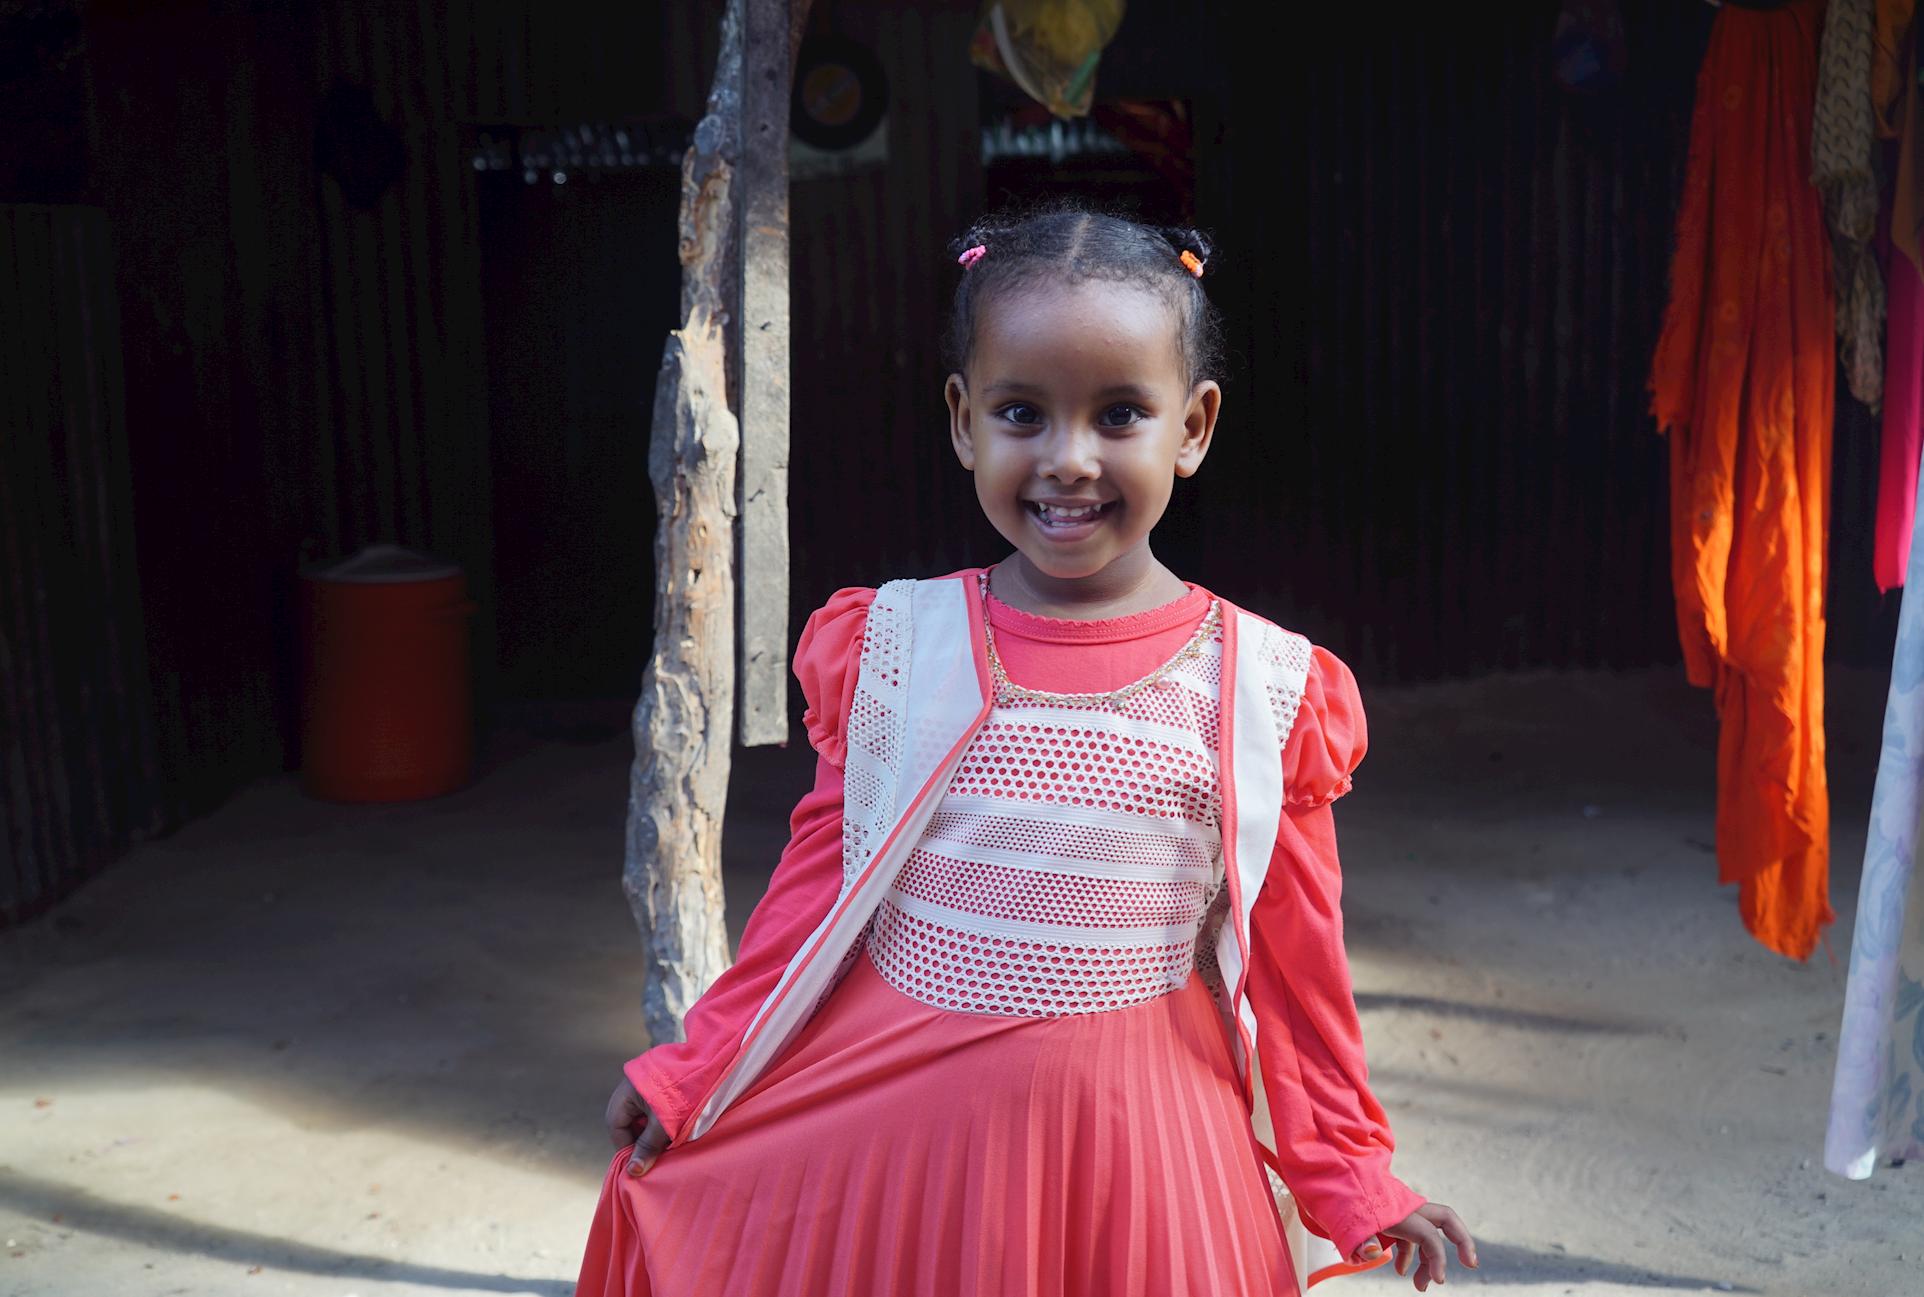 Four-year-old orphan, Nafisa